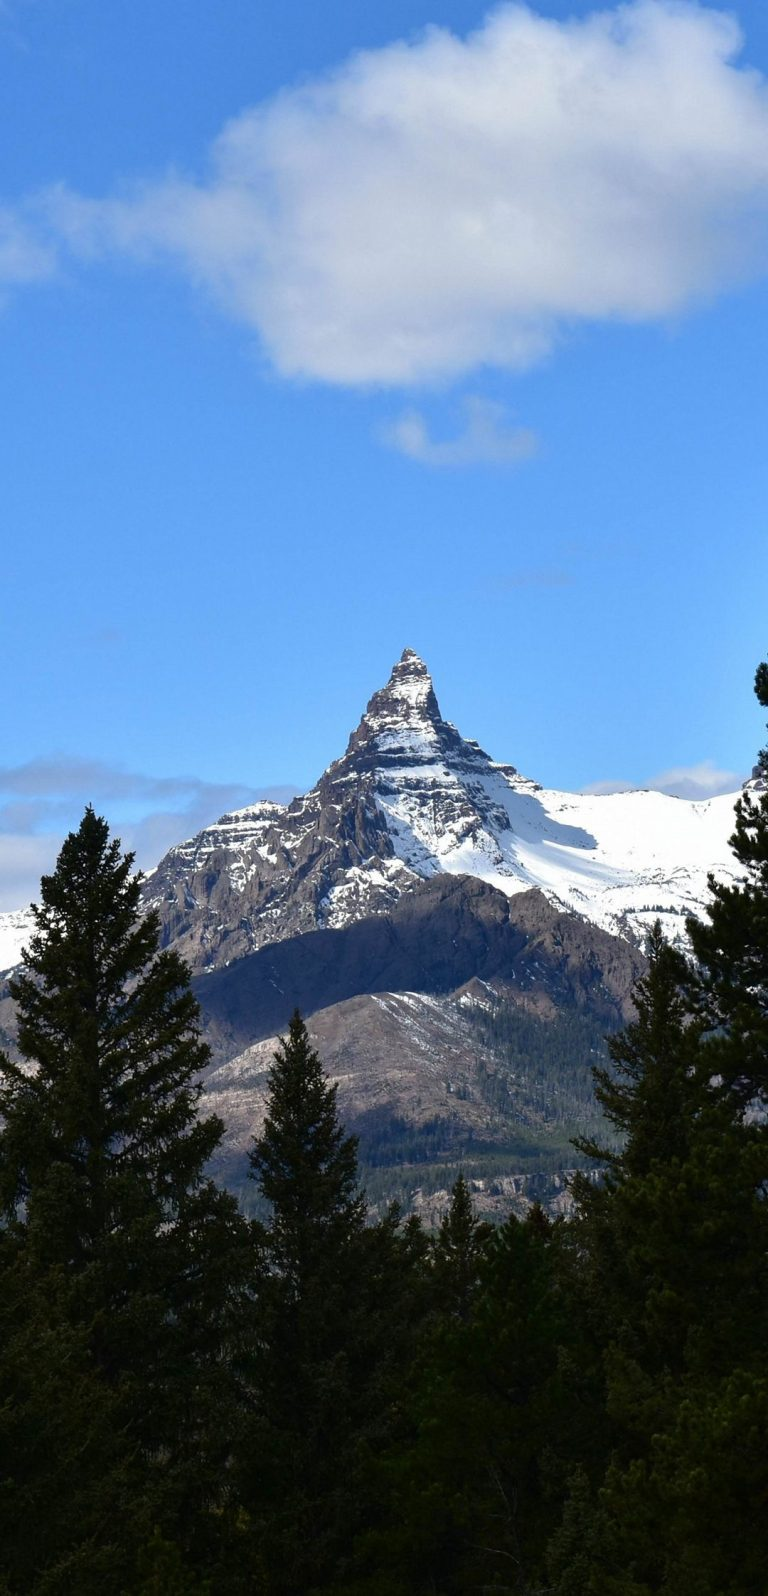 Index Peak Yellowstone Wallpaper 1080x2244 768x1596